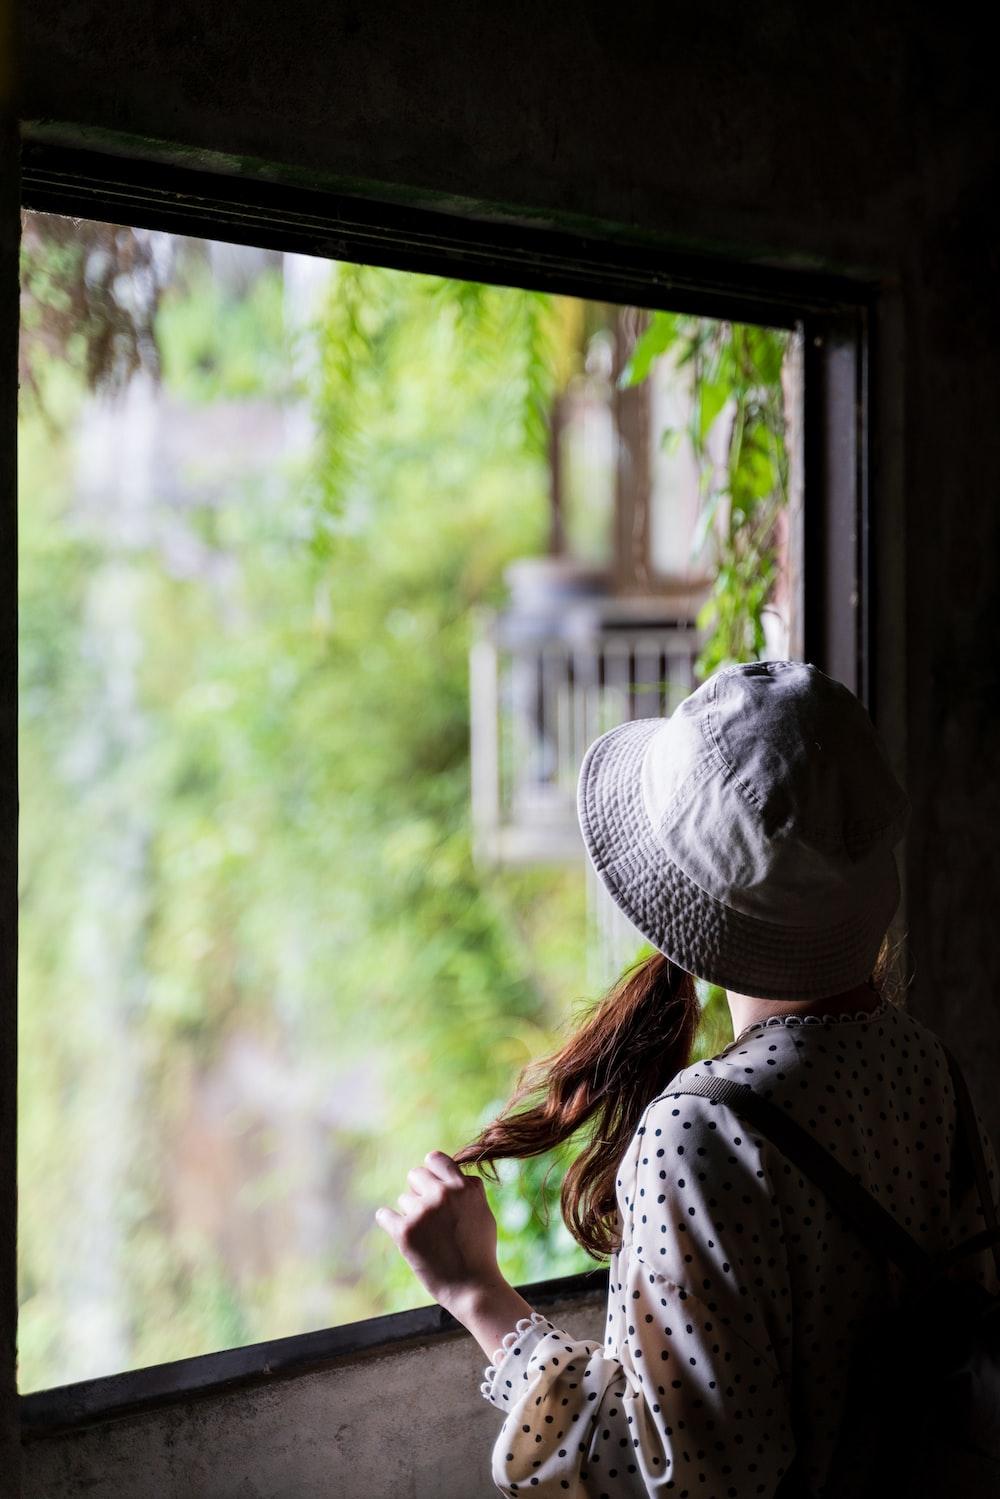 woman in white and black polka dot shirt standing near window